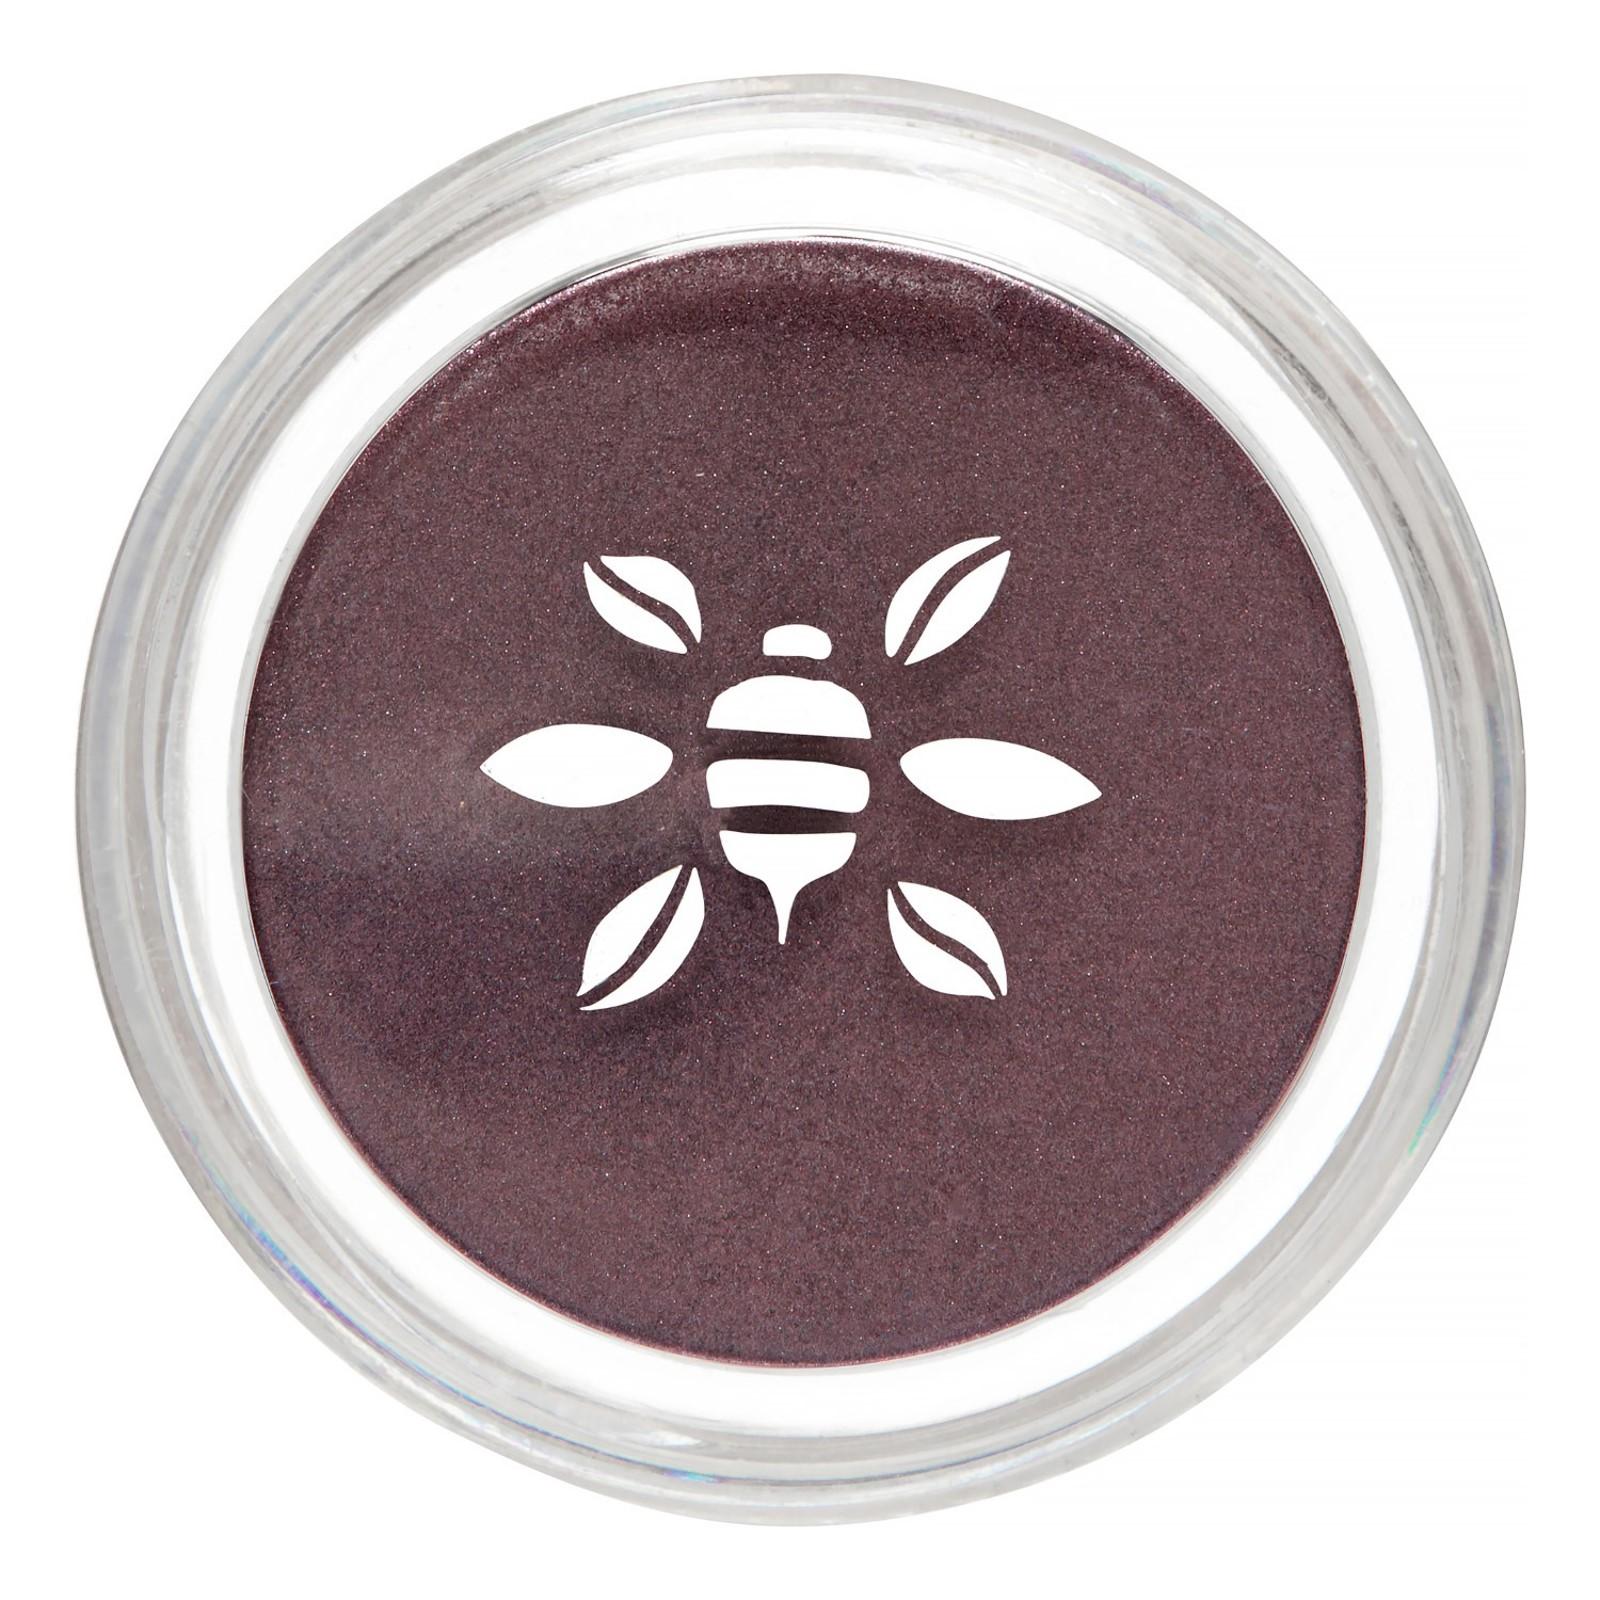 Honeybee Gardens PowderColors Stackable Mineral Color Temptress (1x2g)